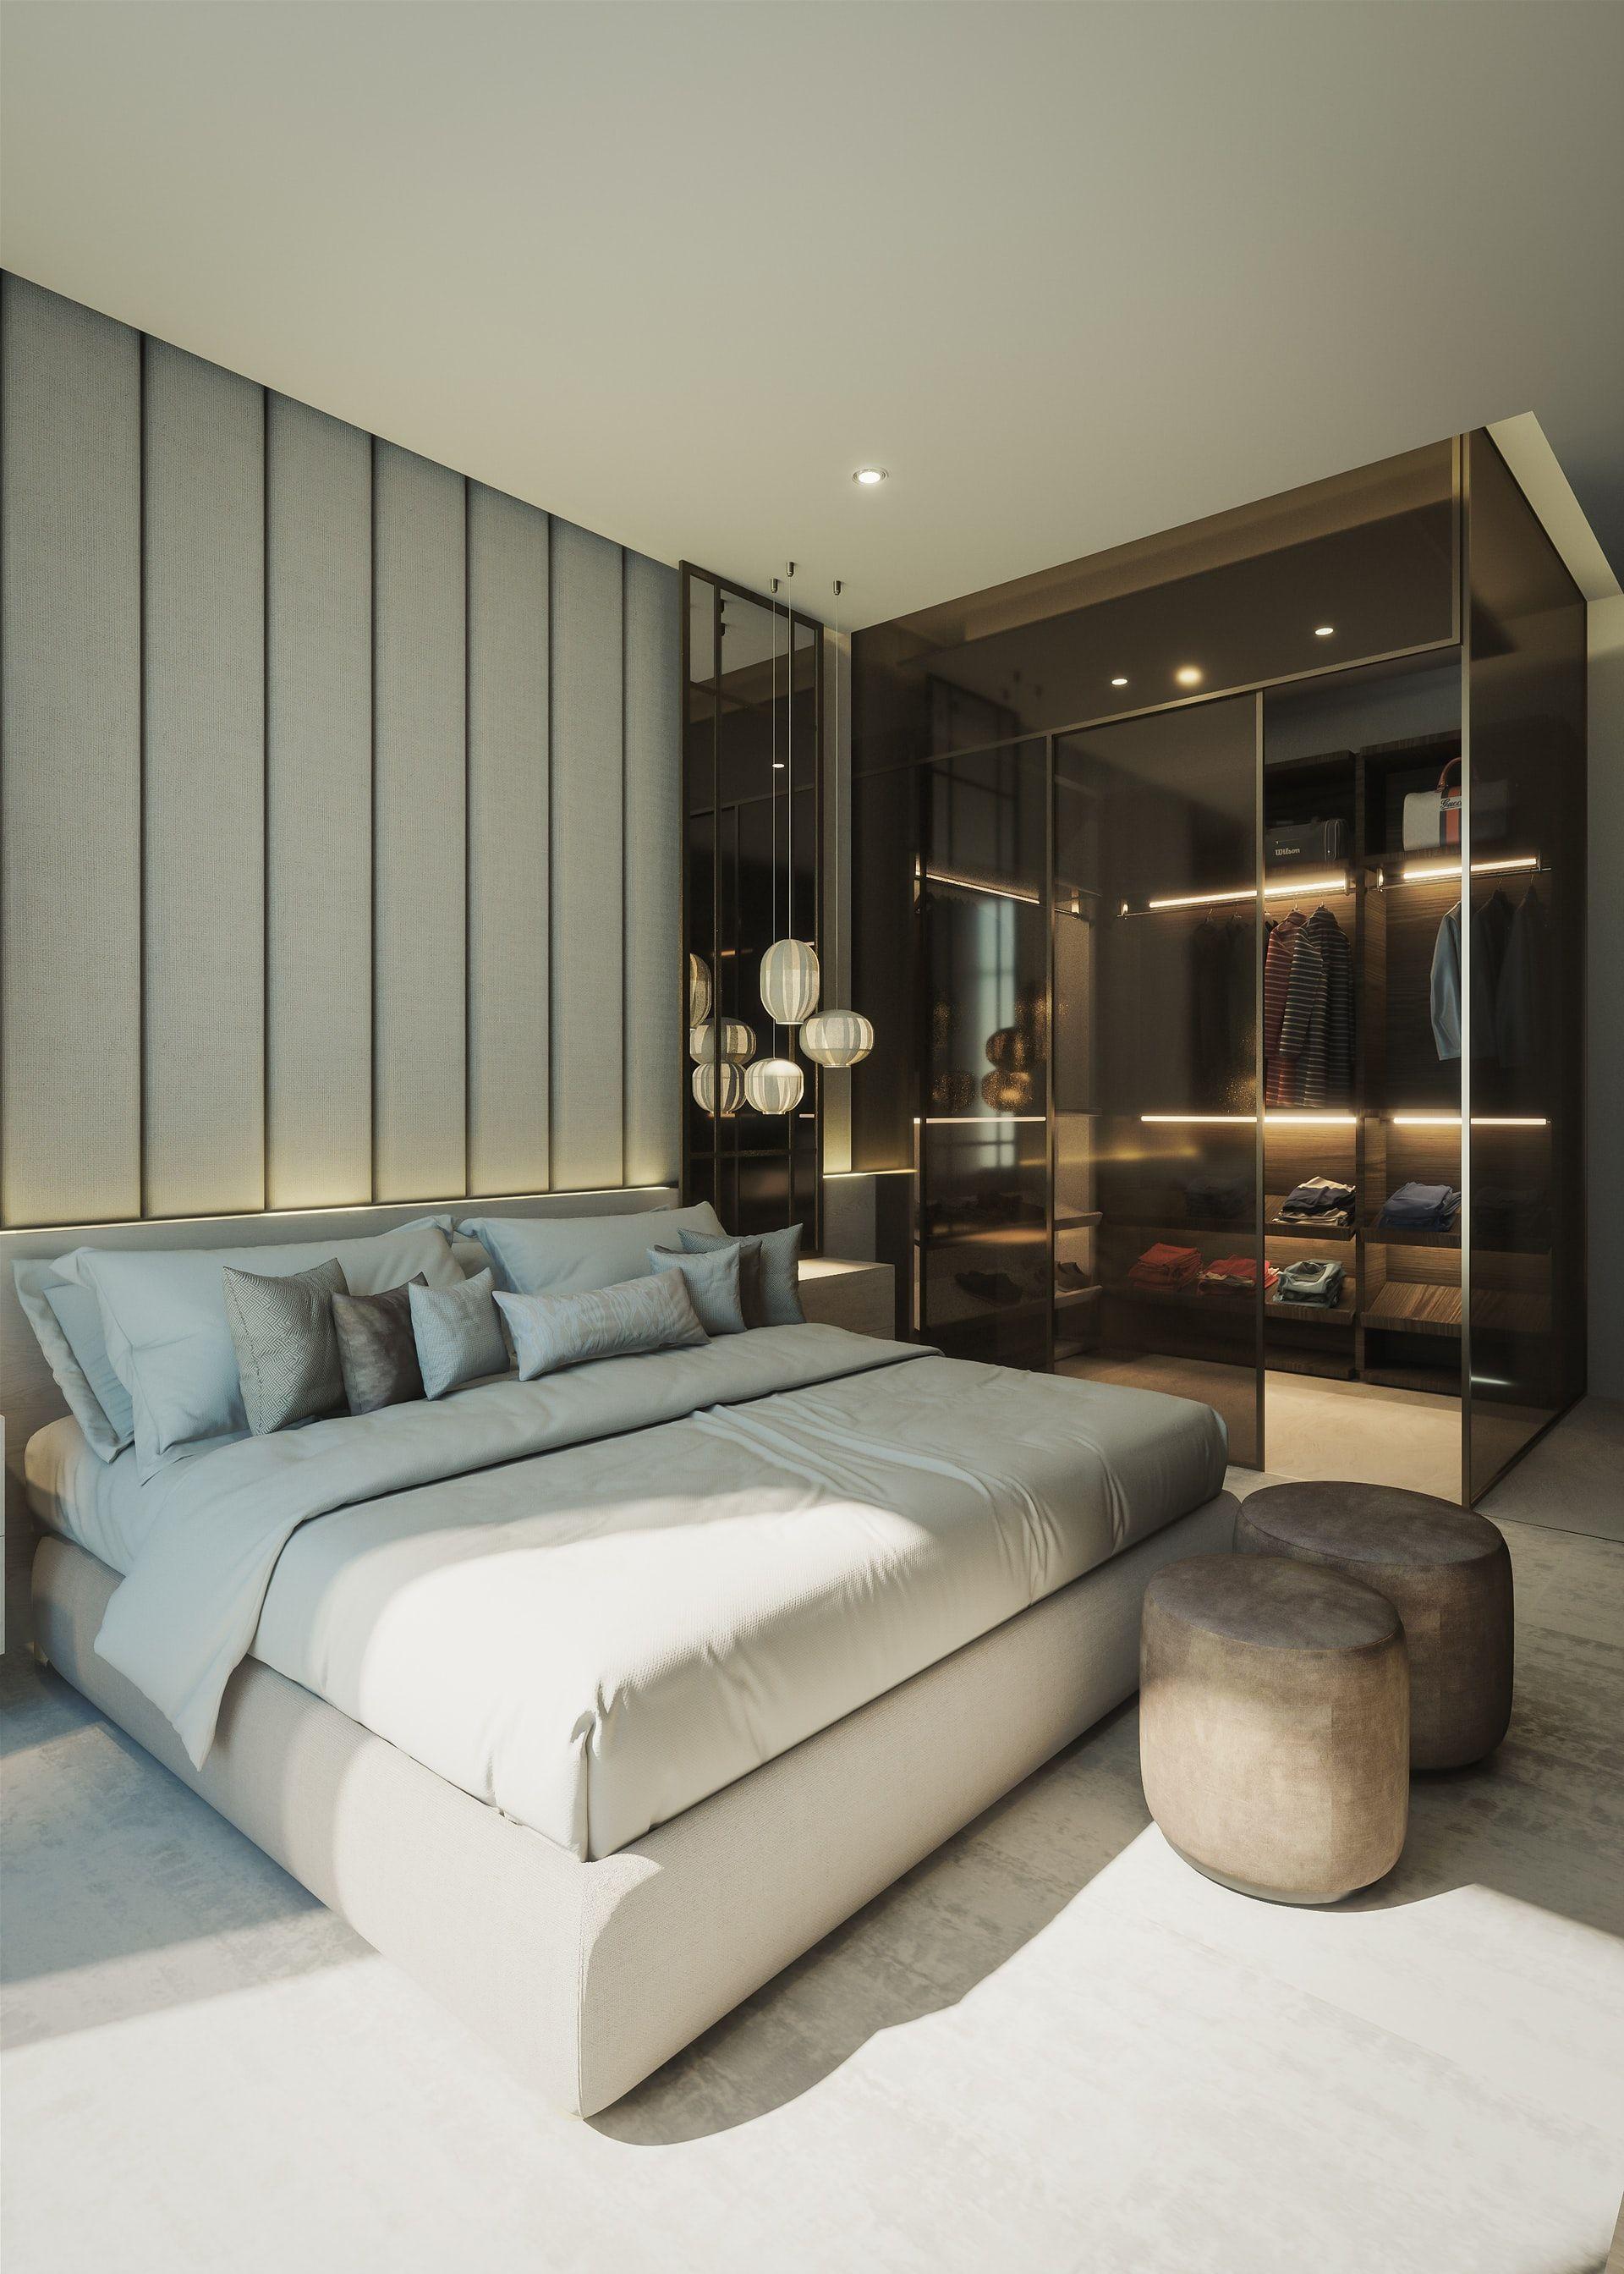 Master Bedroom Decorating Ideas To Inspire Your Next Remodel Master Bedrooms Decor Beautiful Bedrooms Master Modern Bedroom Most popular relaxingmaster bedroom